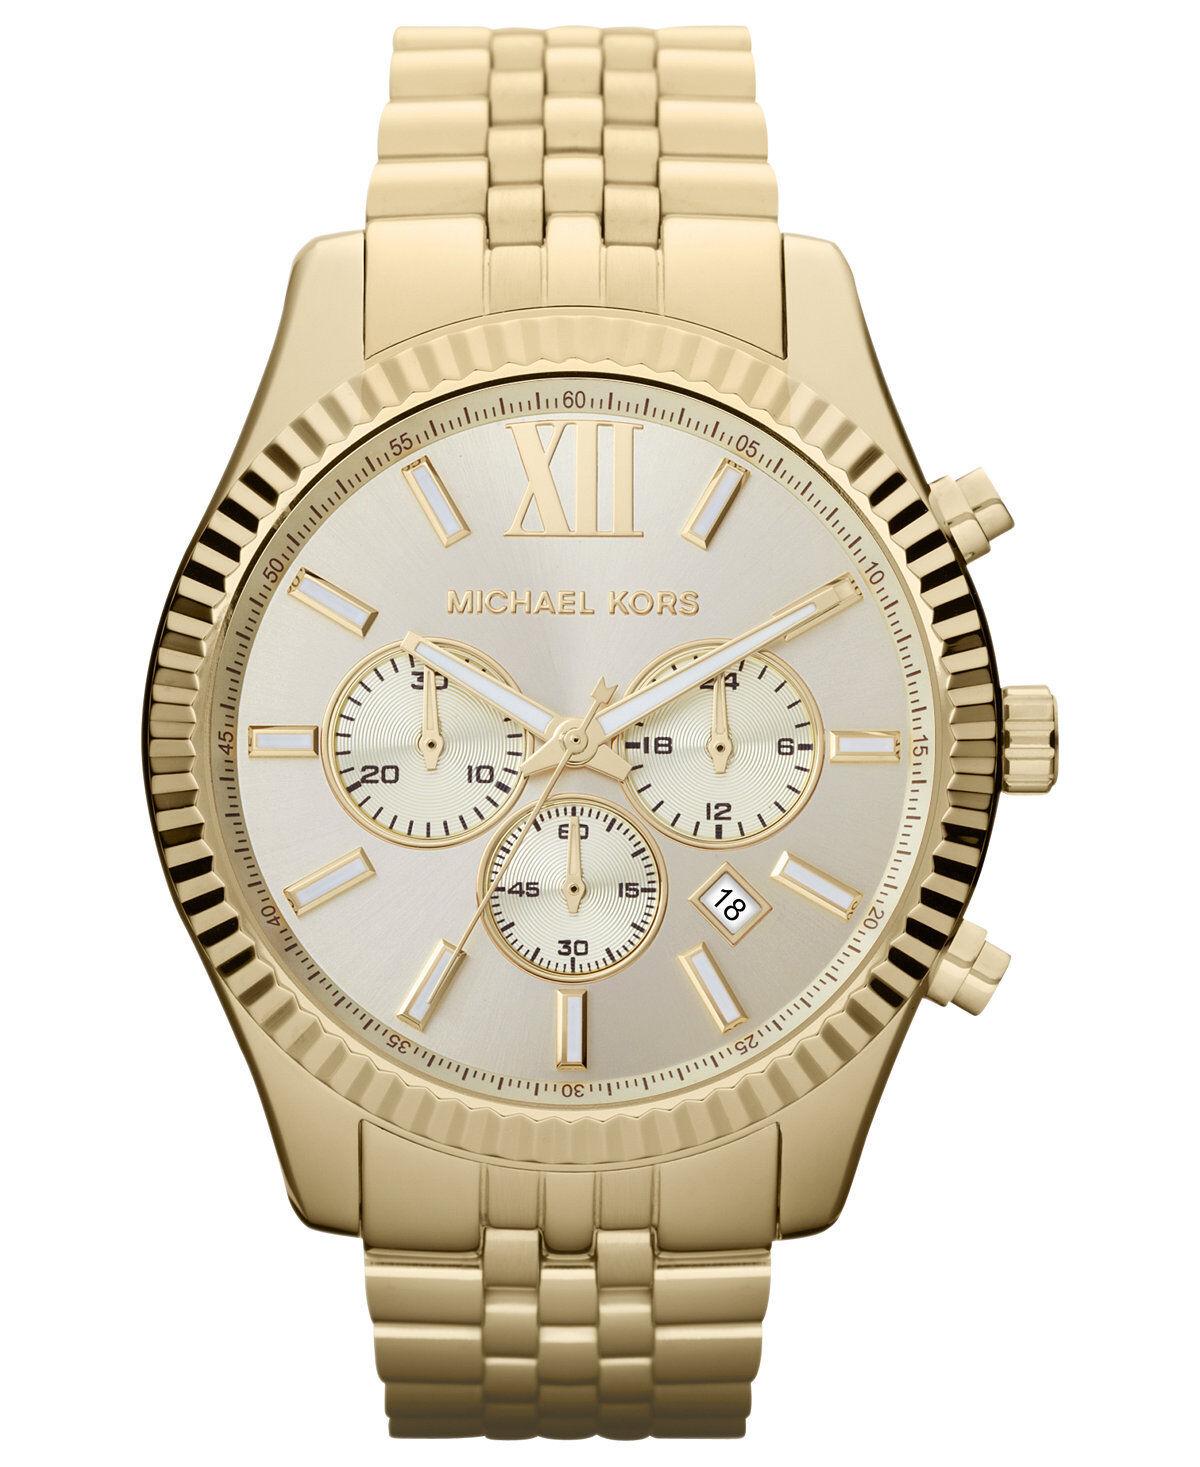 Купить Michael Kors MK8281 - New Michael Kors MK8281 Lexington Gold Stainless Steel Chronograph Men's Watch